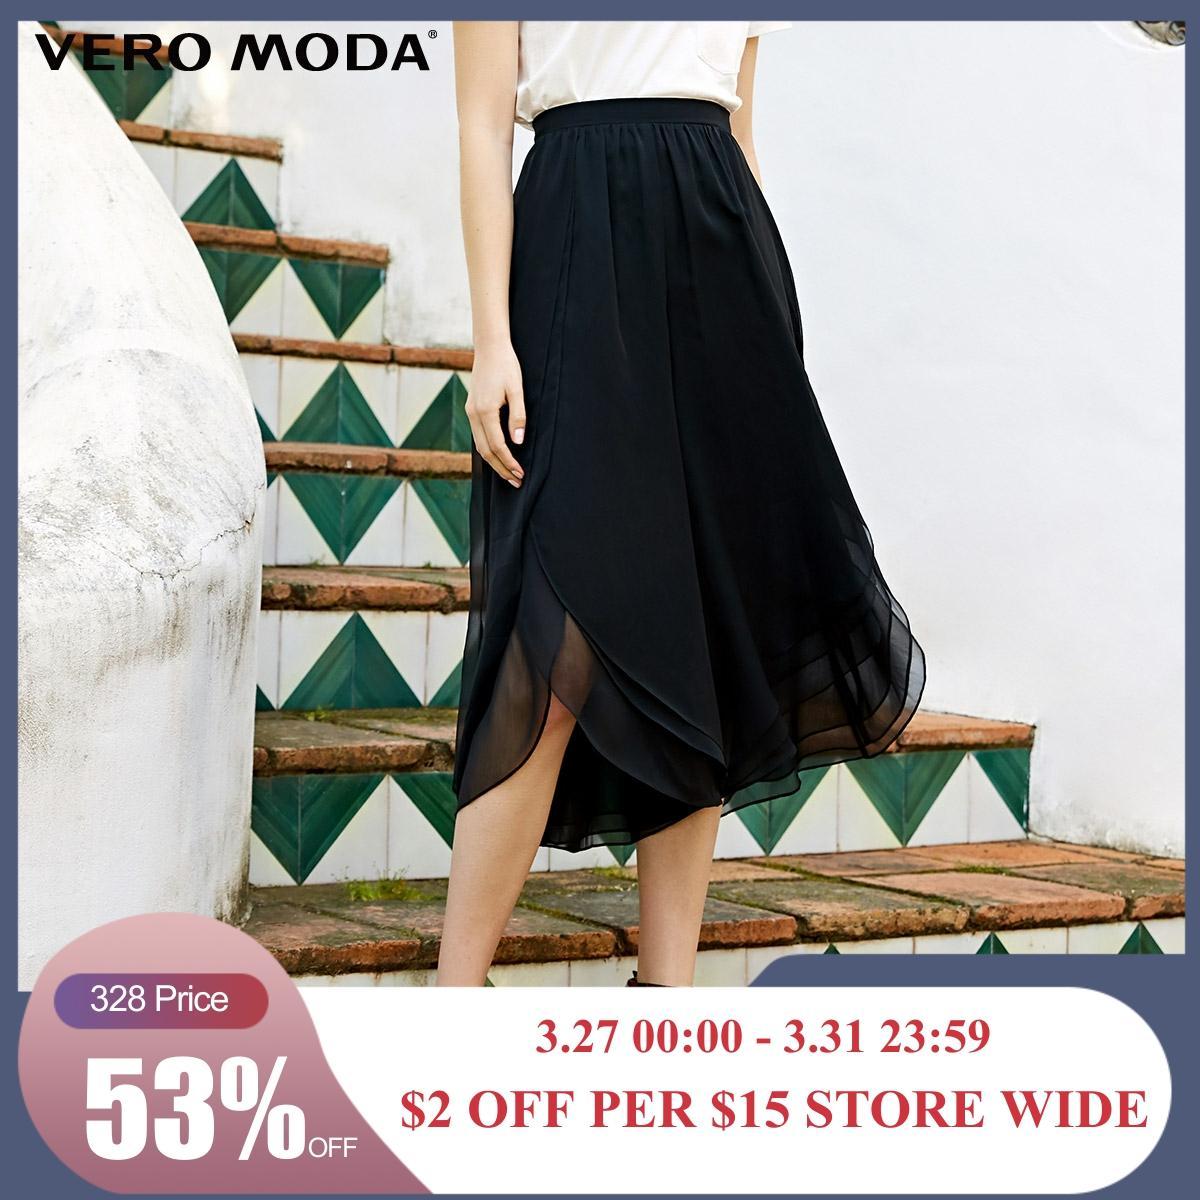 Vero Moda New Arrivals Ins Style Draped Capri Pants | 31926J533